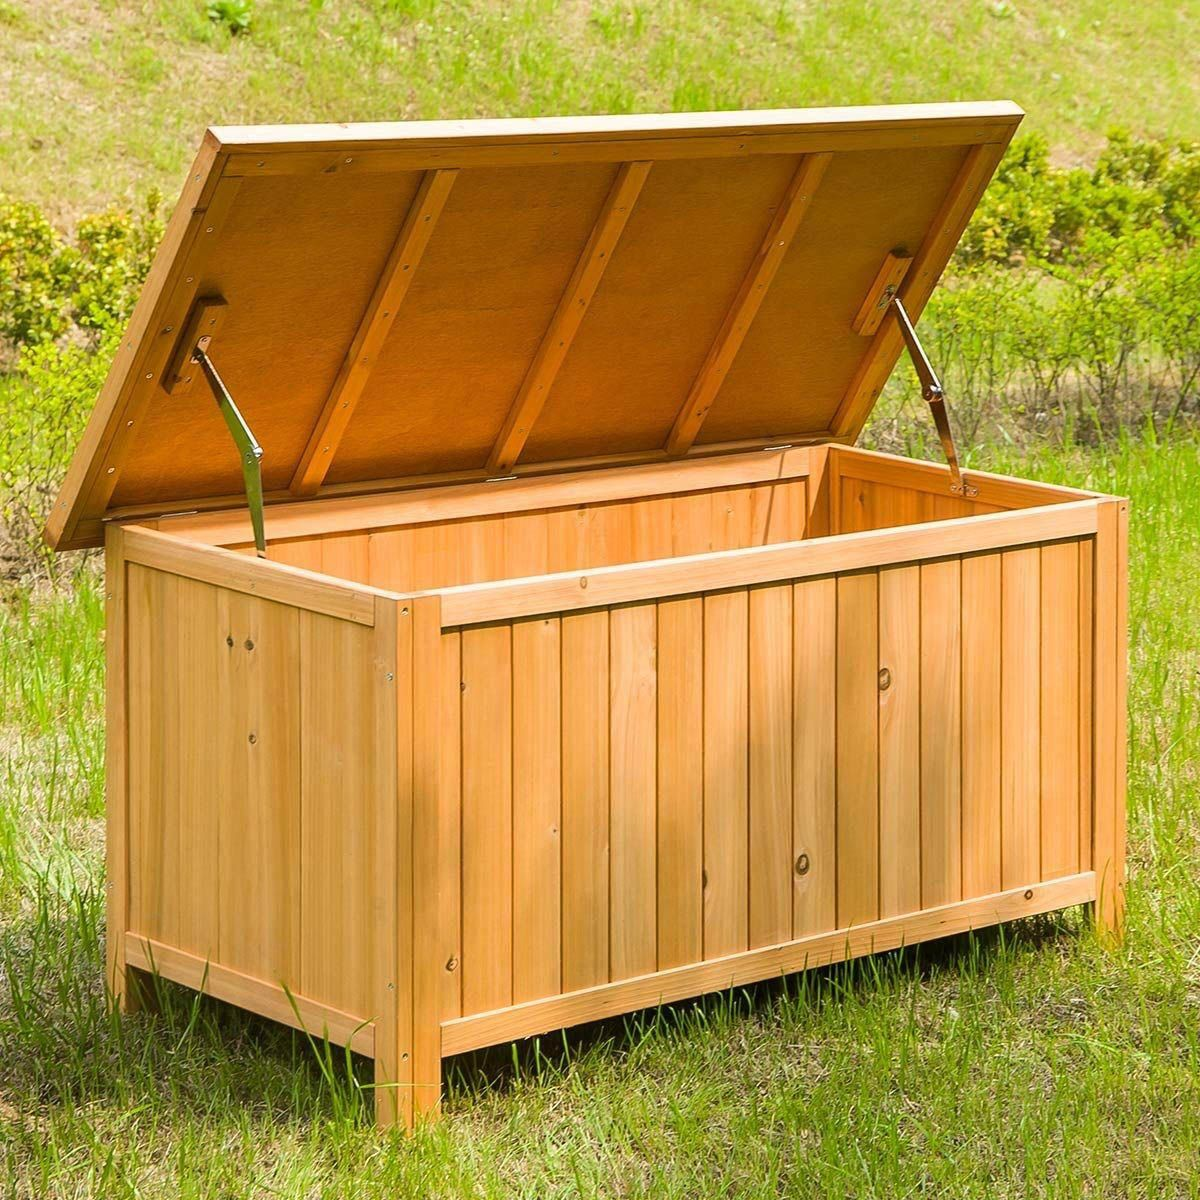 10 charming diy outdoor storage ideas